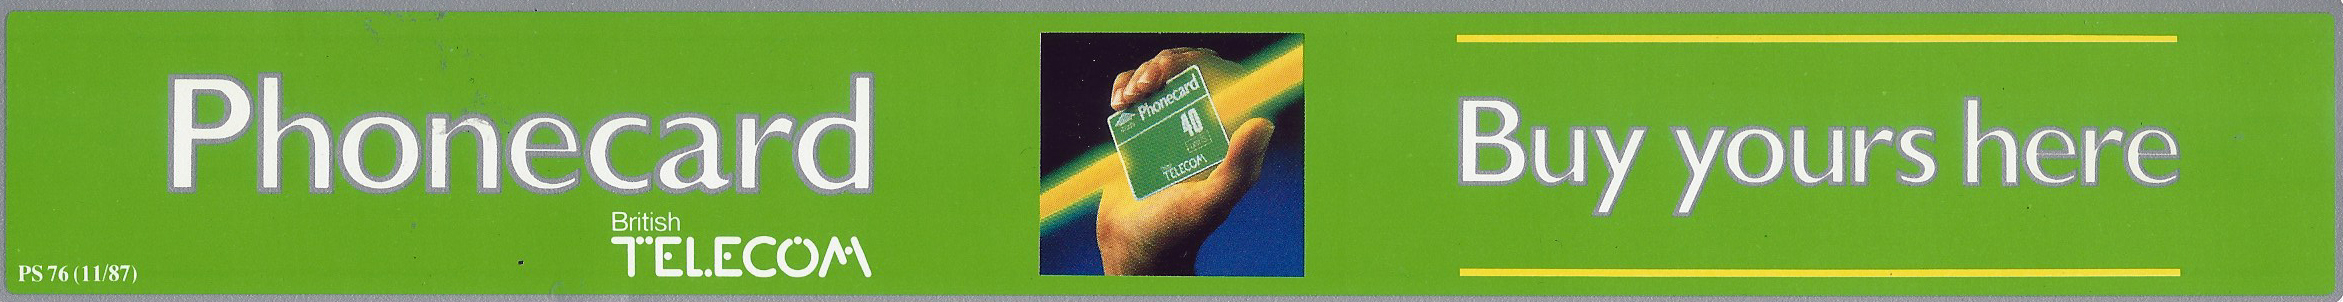 Phonecard advertisement, 1987